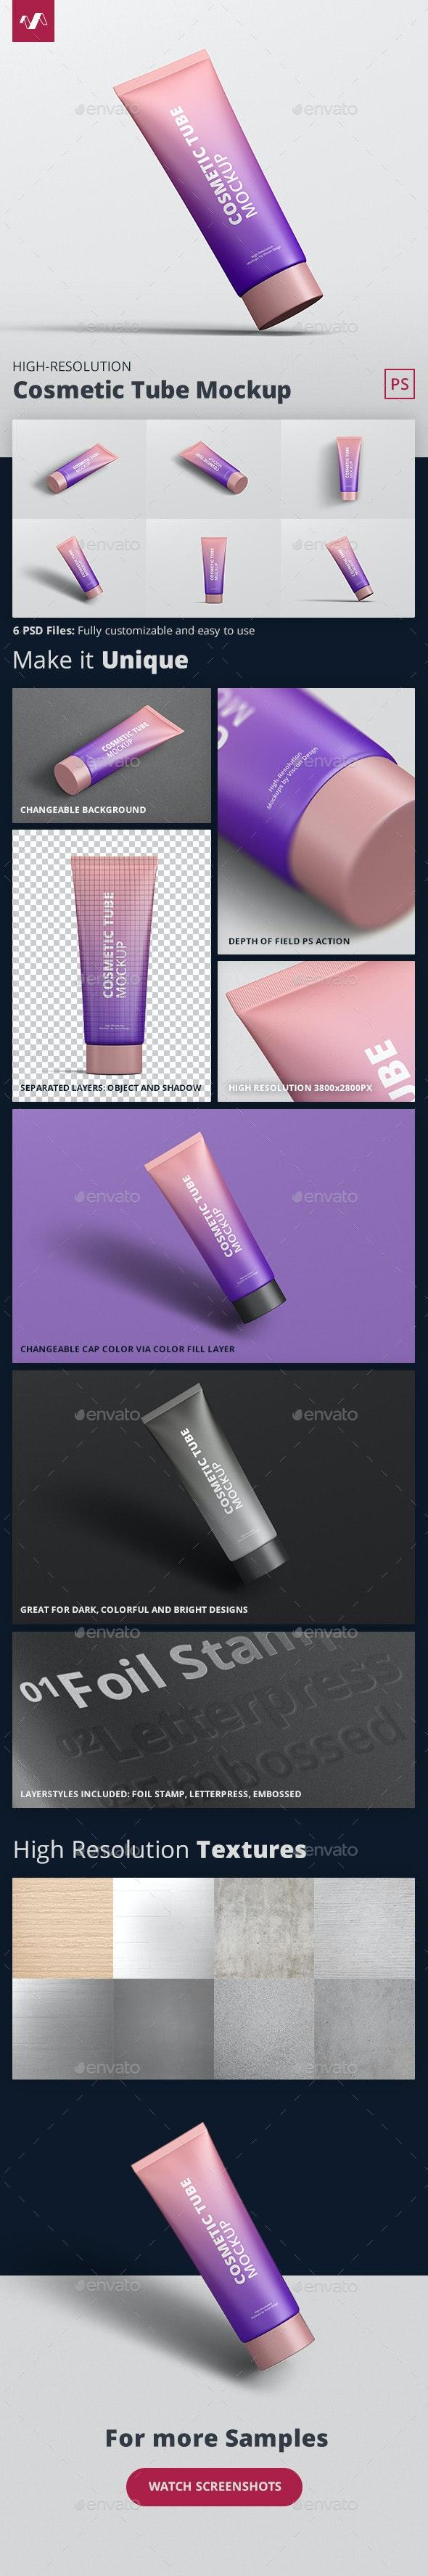 Cosmetic Tube Mockup - Beauty Packaging